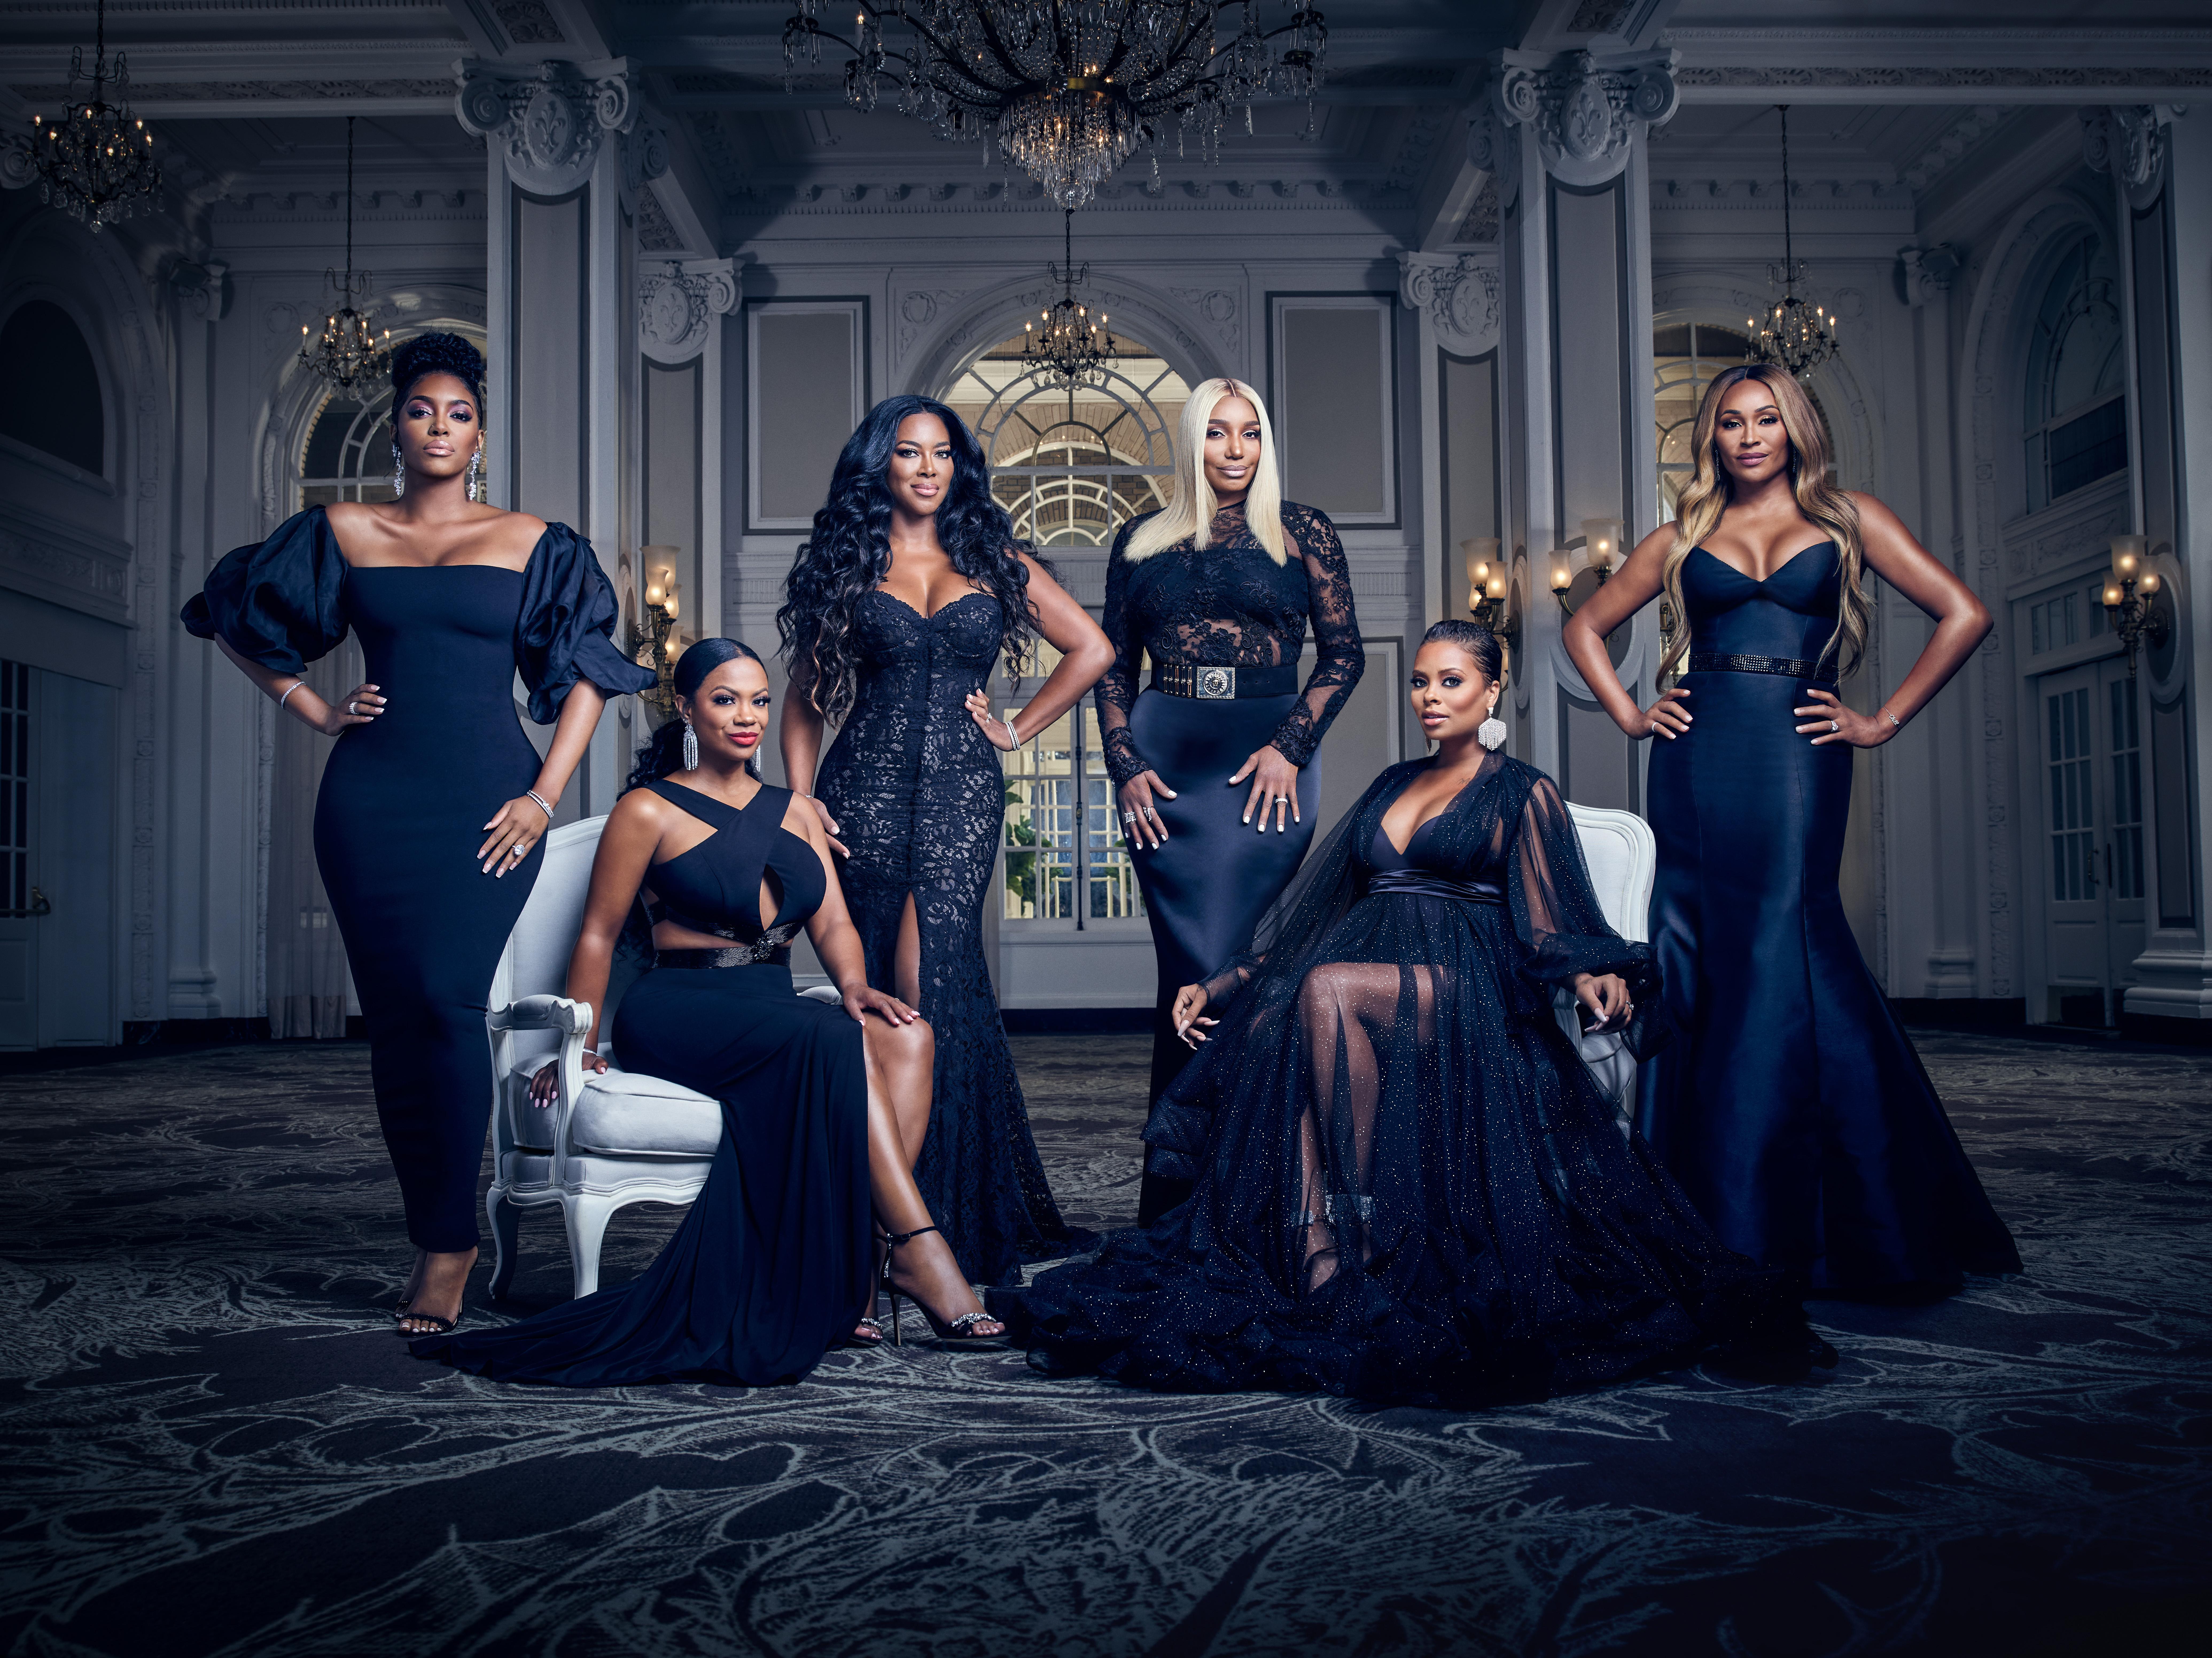 First Look: The Real Housewives Of Atlanta Season 12